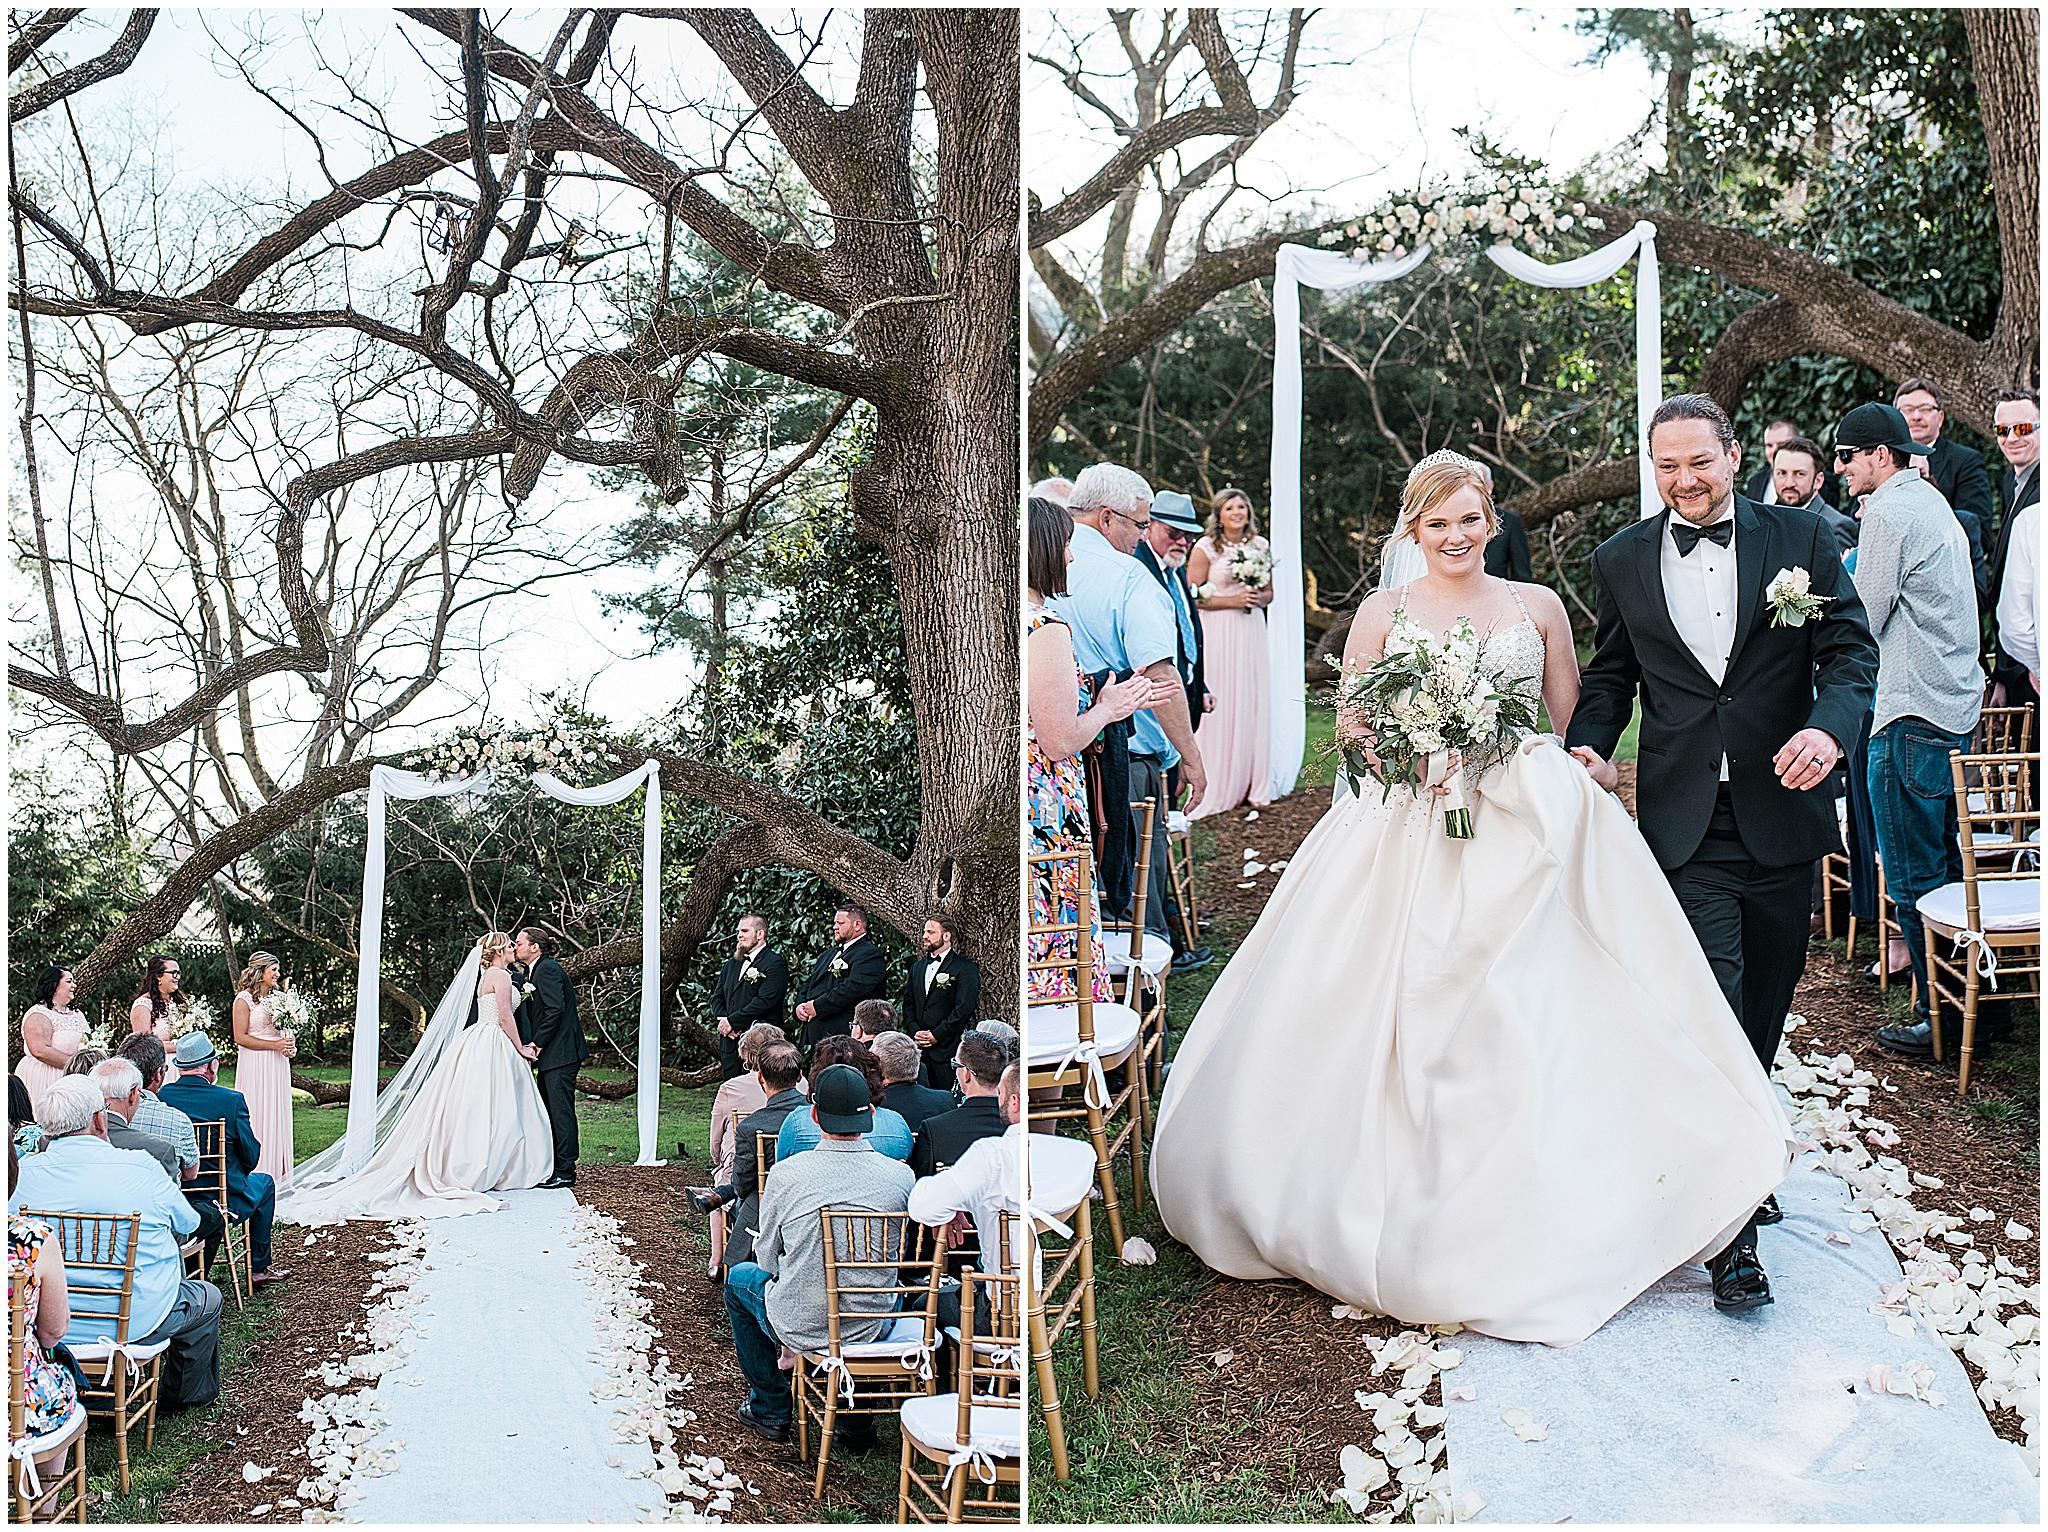 Wedding_Photographers_Asheville_Mountain_Magnolia_Inn_0015.jpg